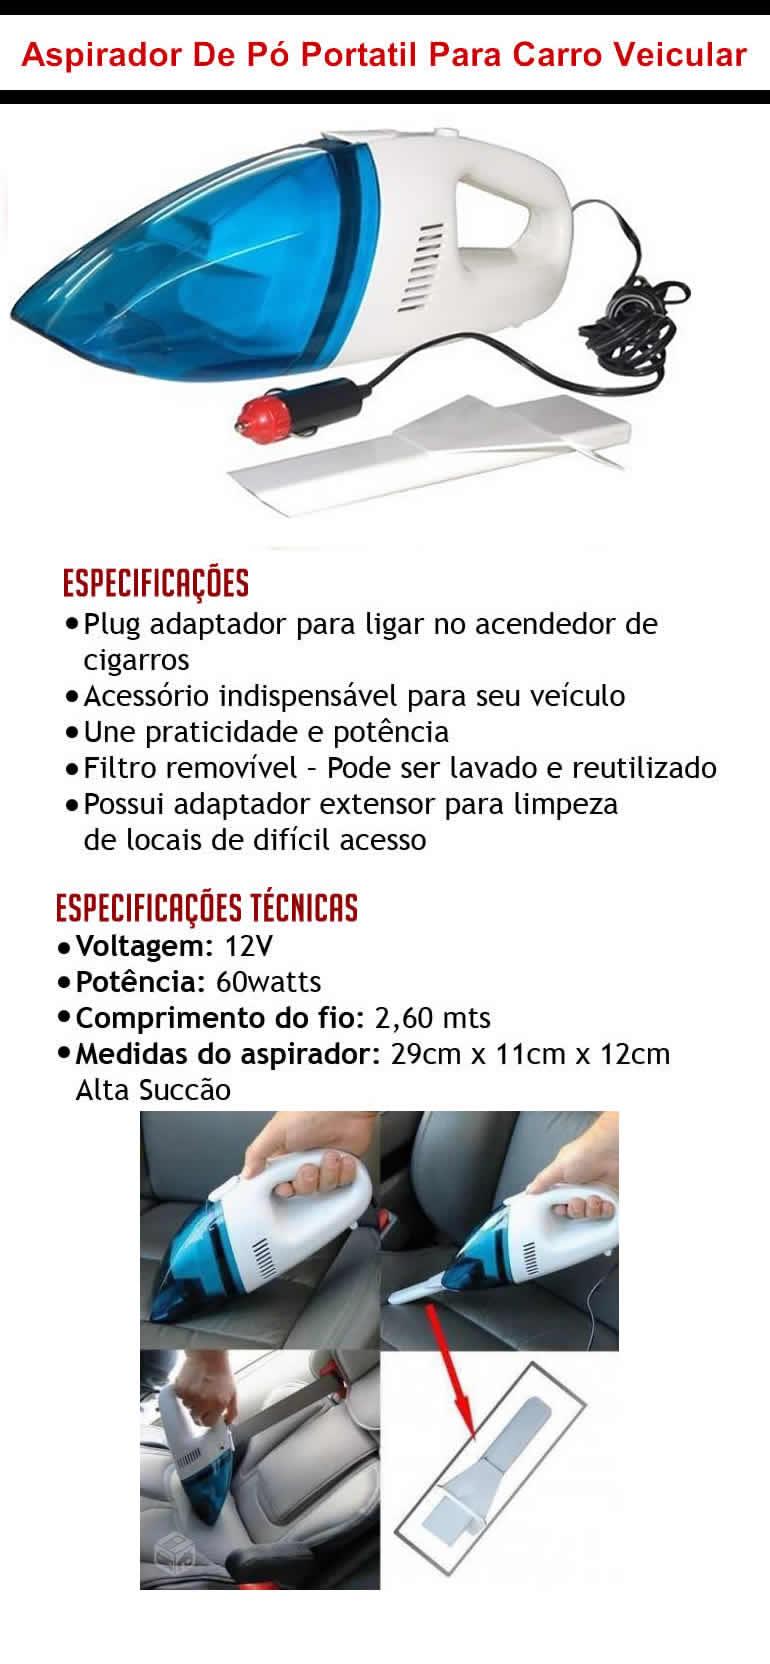 anuncio.jpg (770×1347)